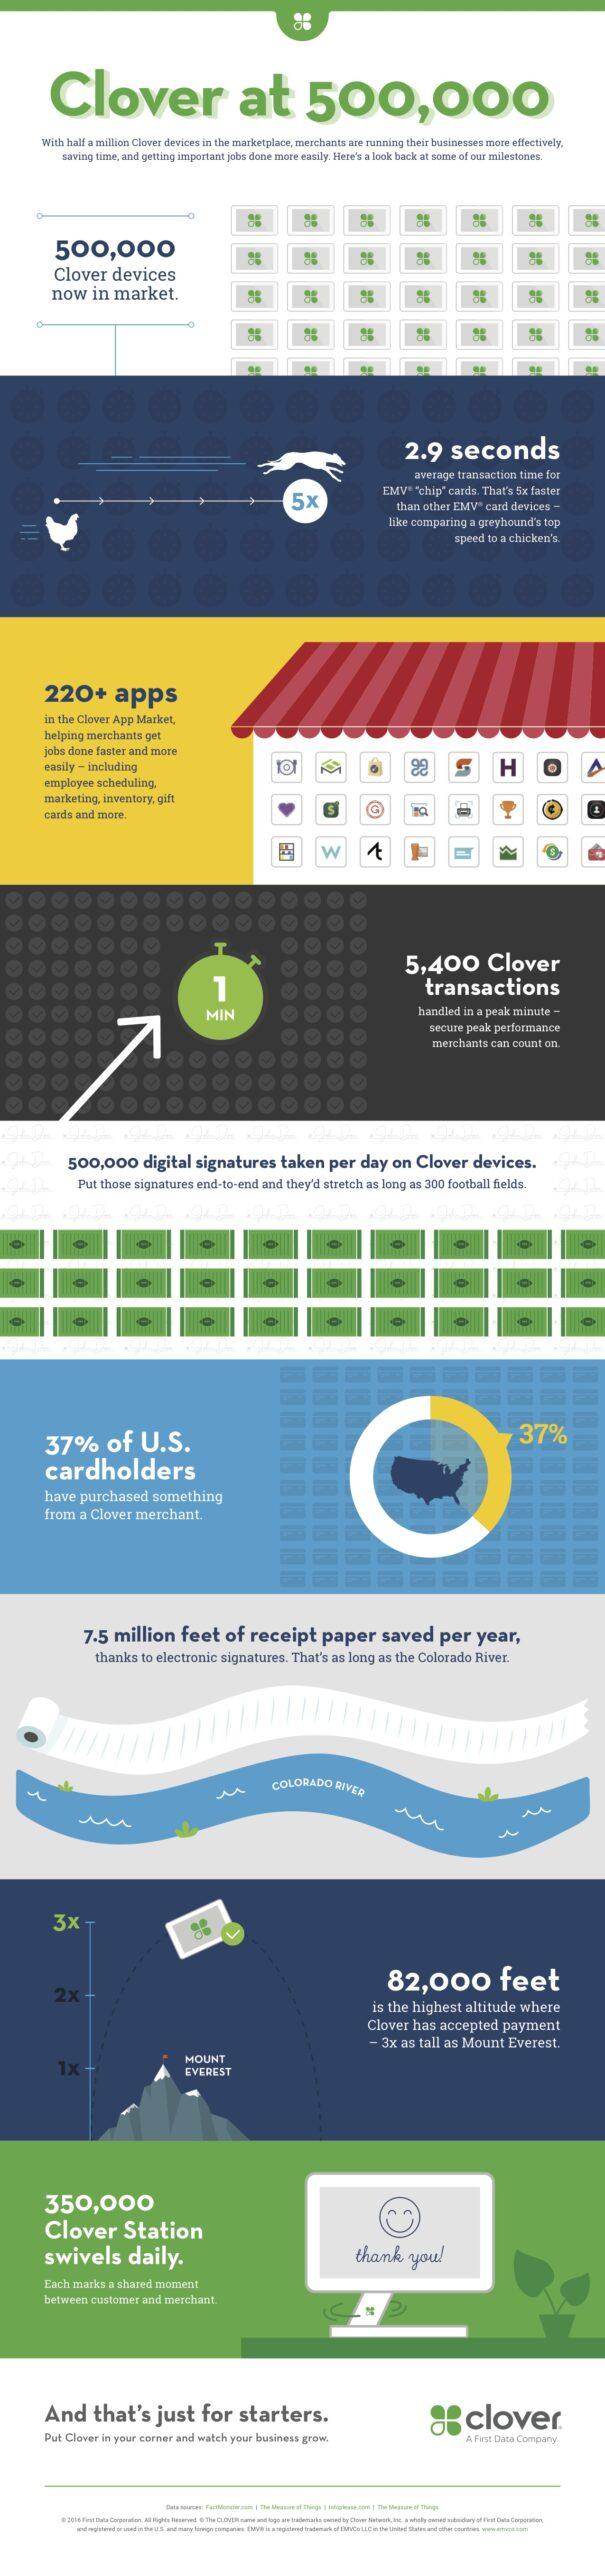 clover-500k-infographic-final